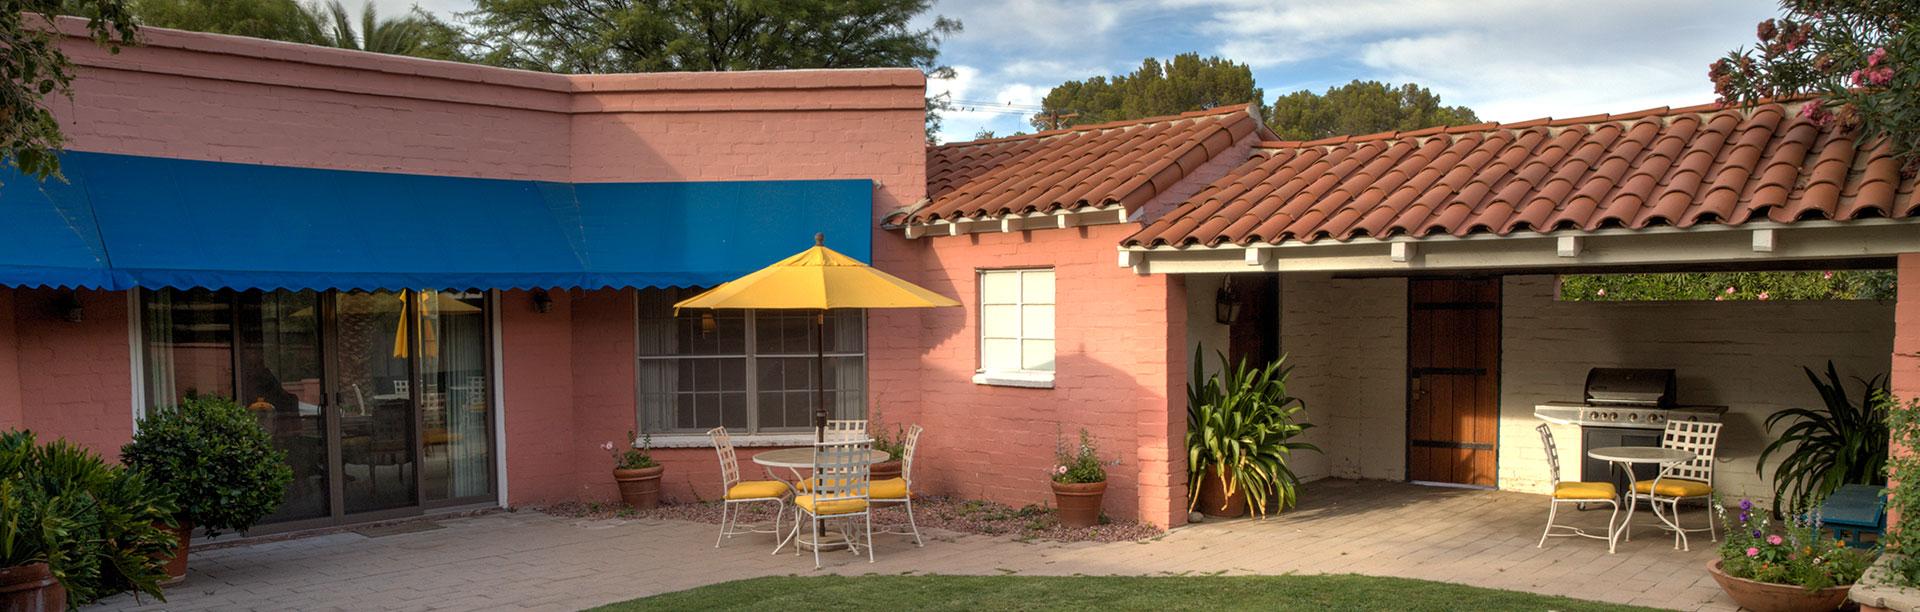 Amenities at Arizona Inn, Tucson